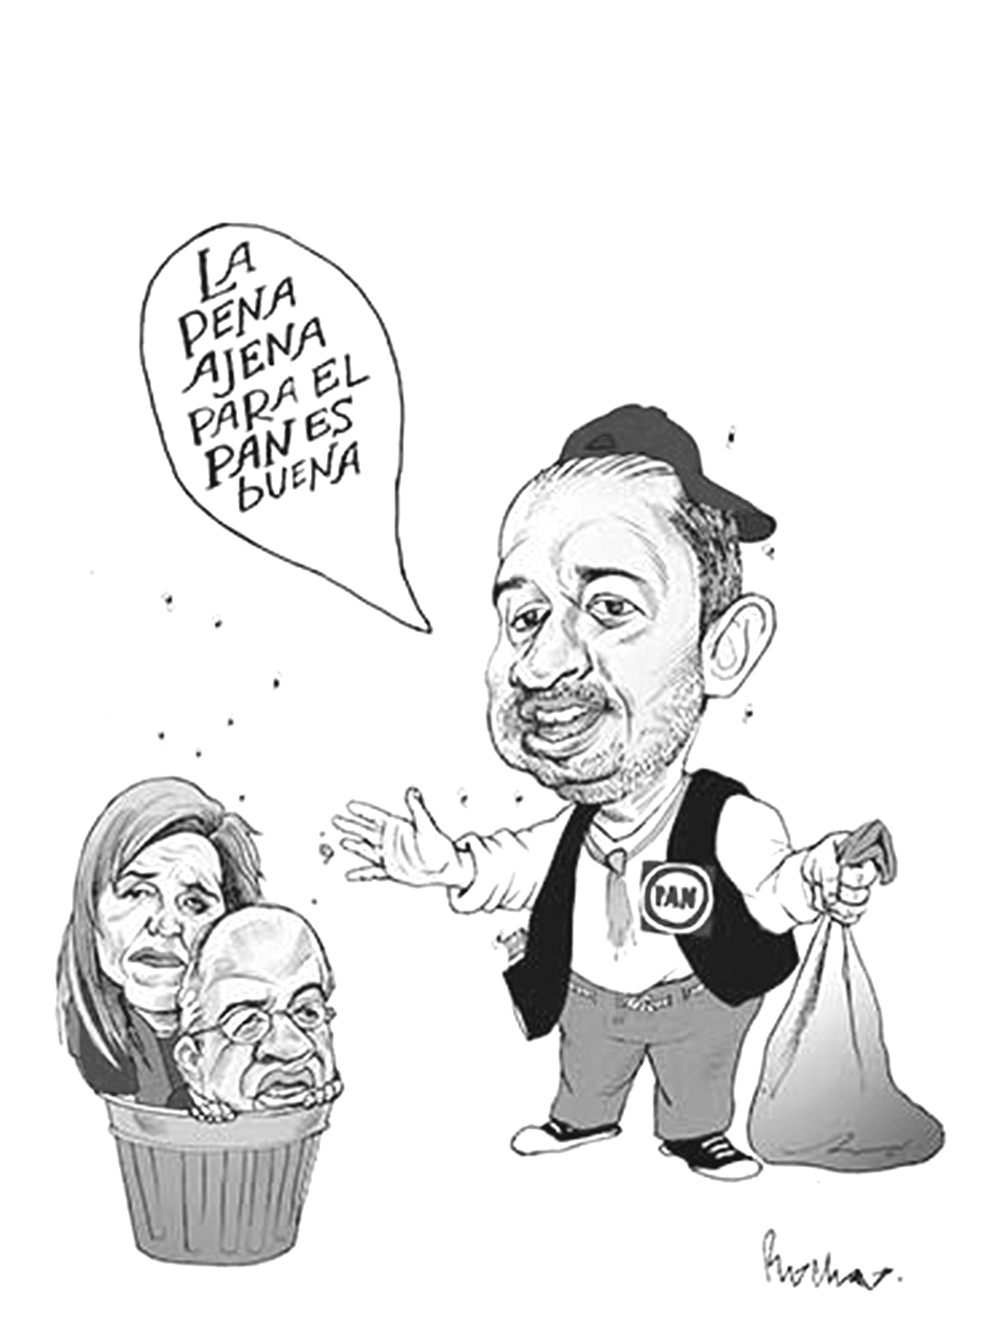 LA PENA Y LA PEPENA-Rocha